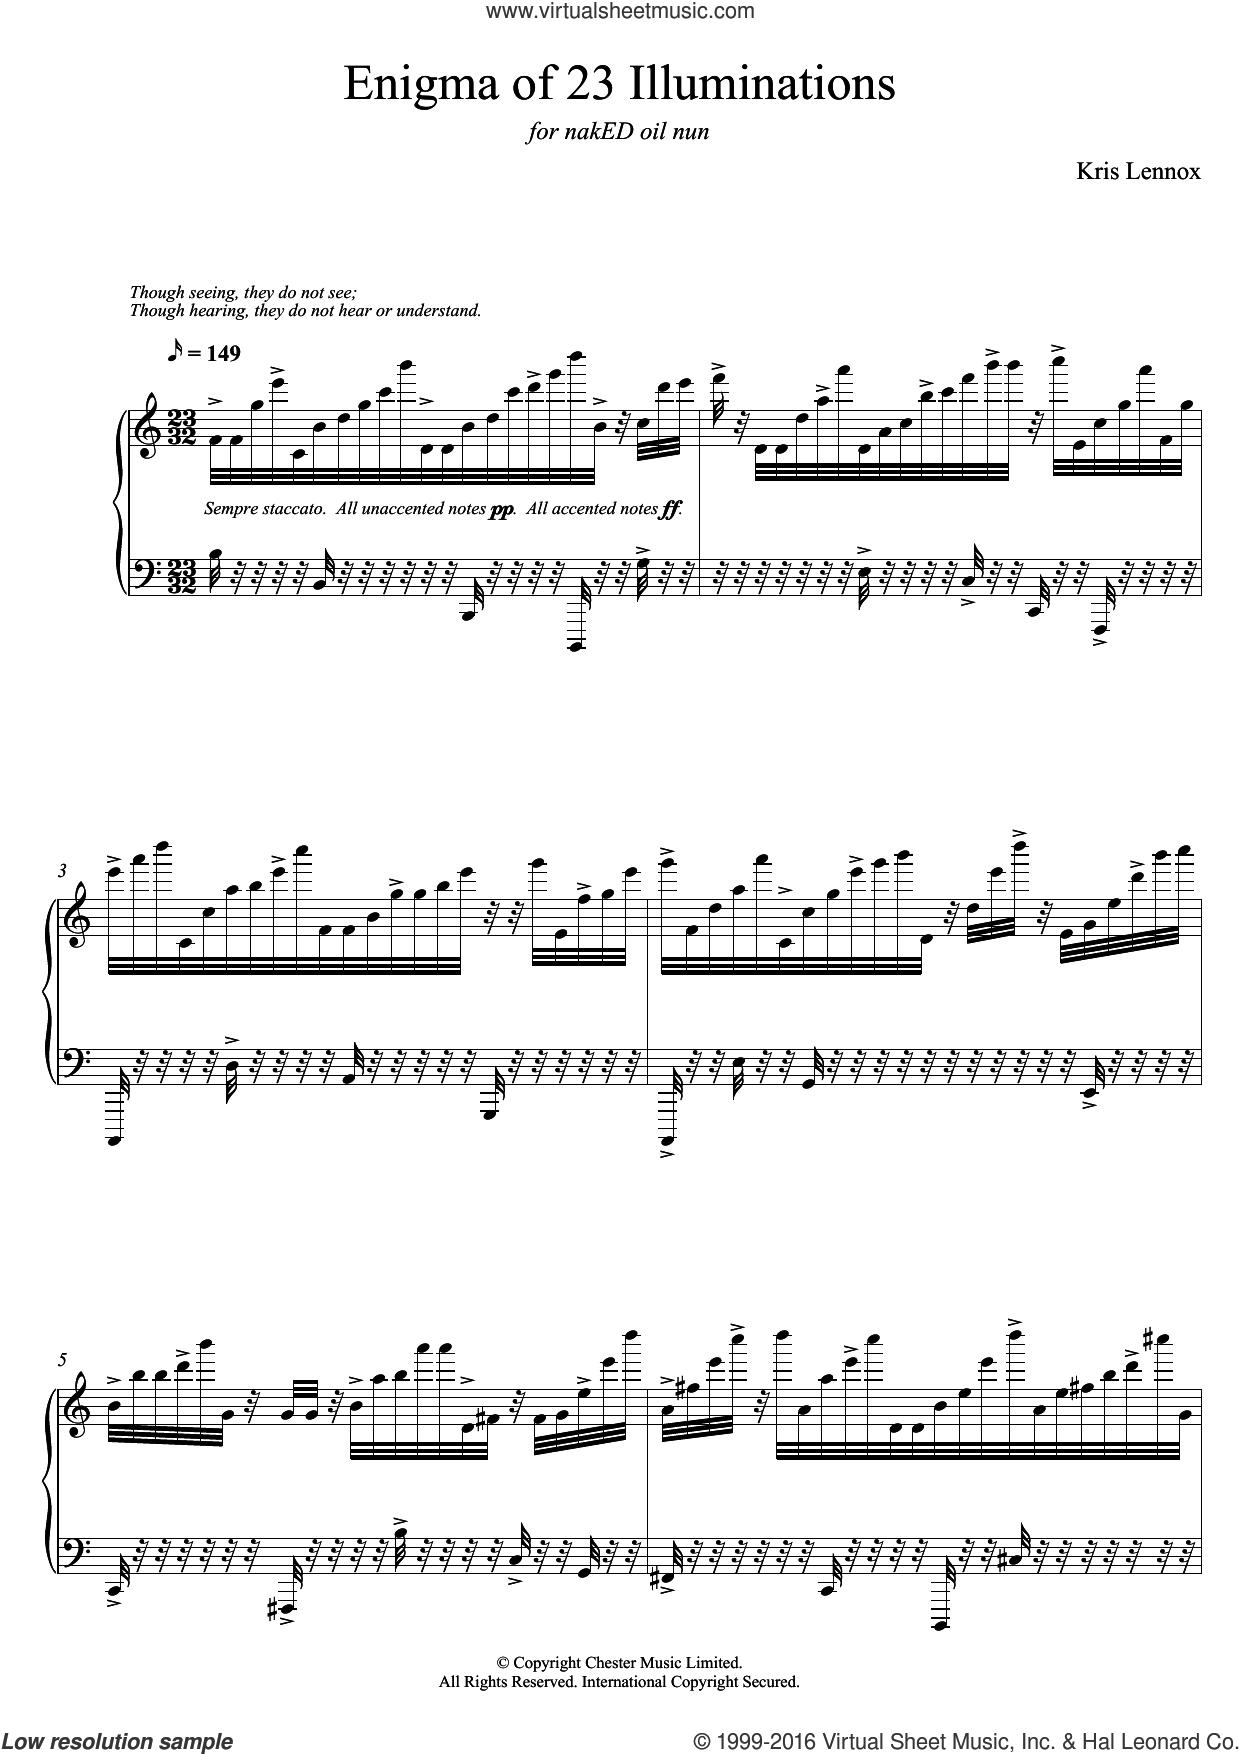 Enigma of 23 Illuminations sheet music for piano solo by Kris Lennox, classical score, intermediate skill level